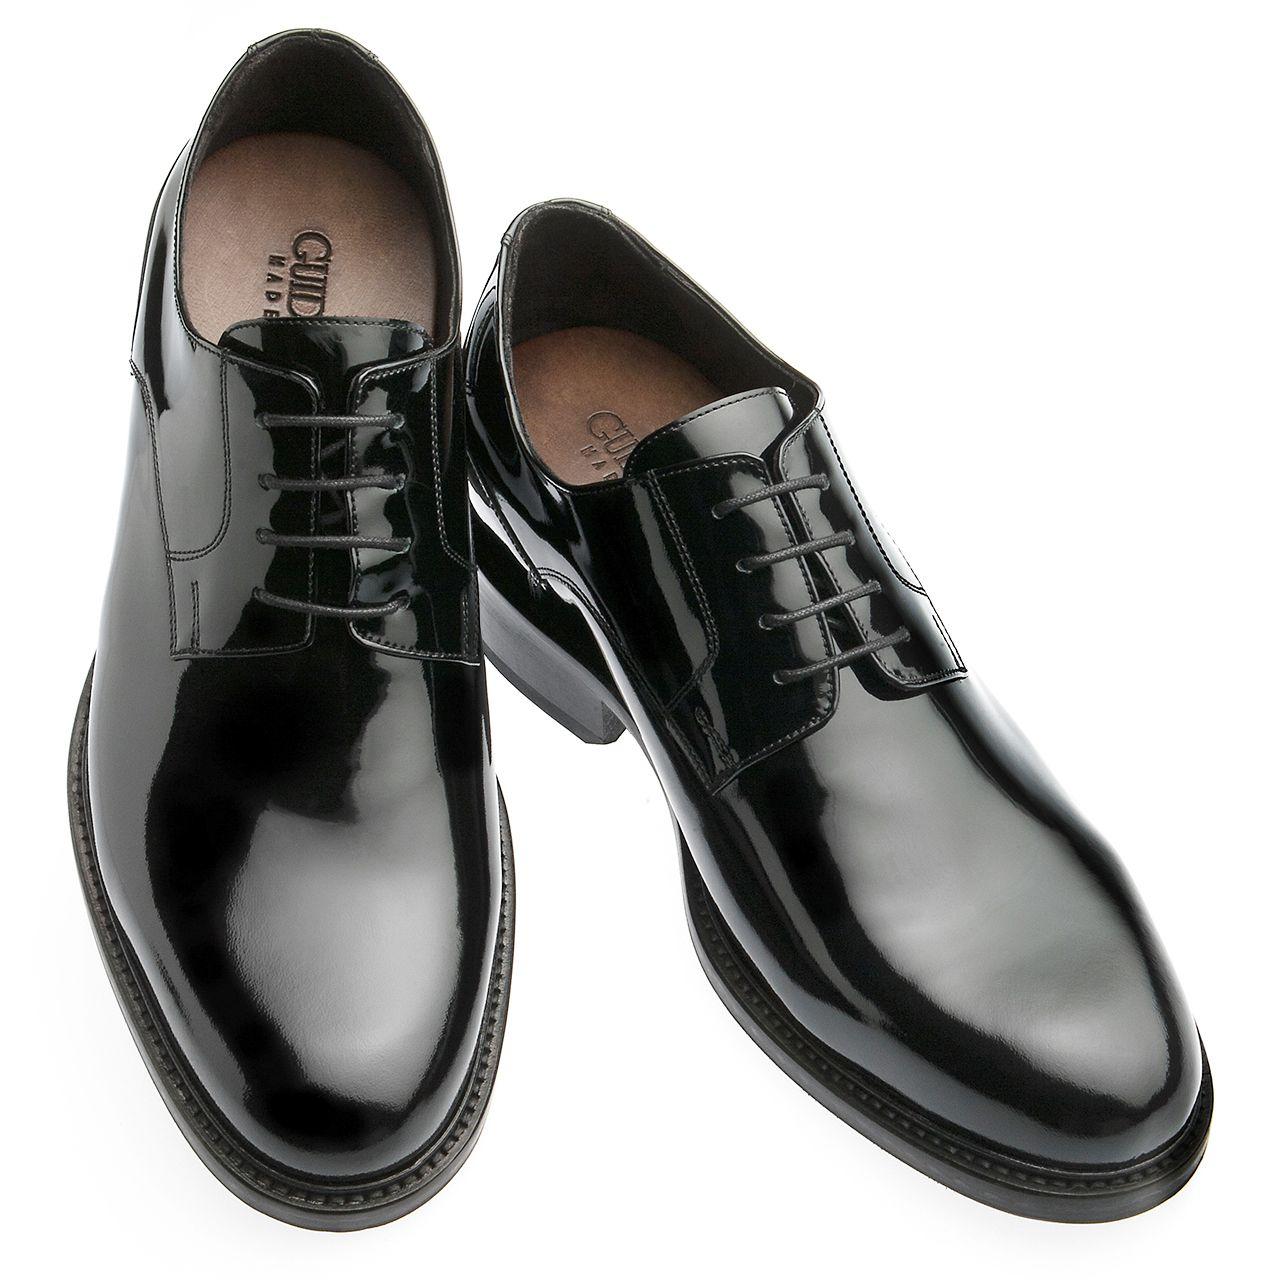 e88f75fc2c93e Elevator shoes for Bridegrooms   Height increasing Tuxedo Shoes   Leuca